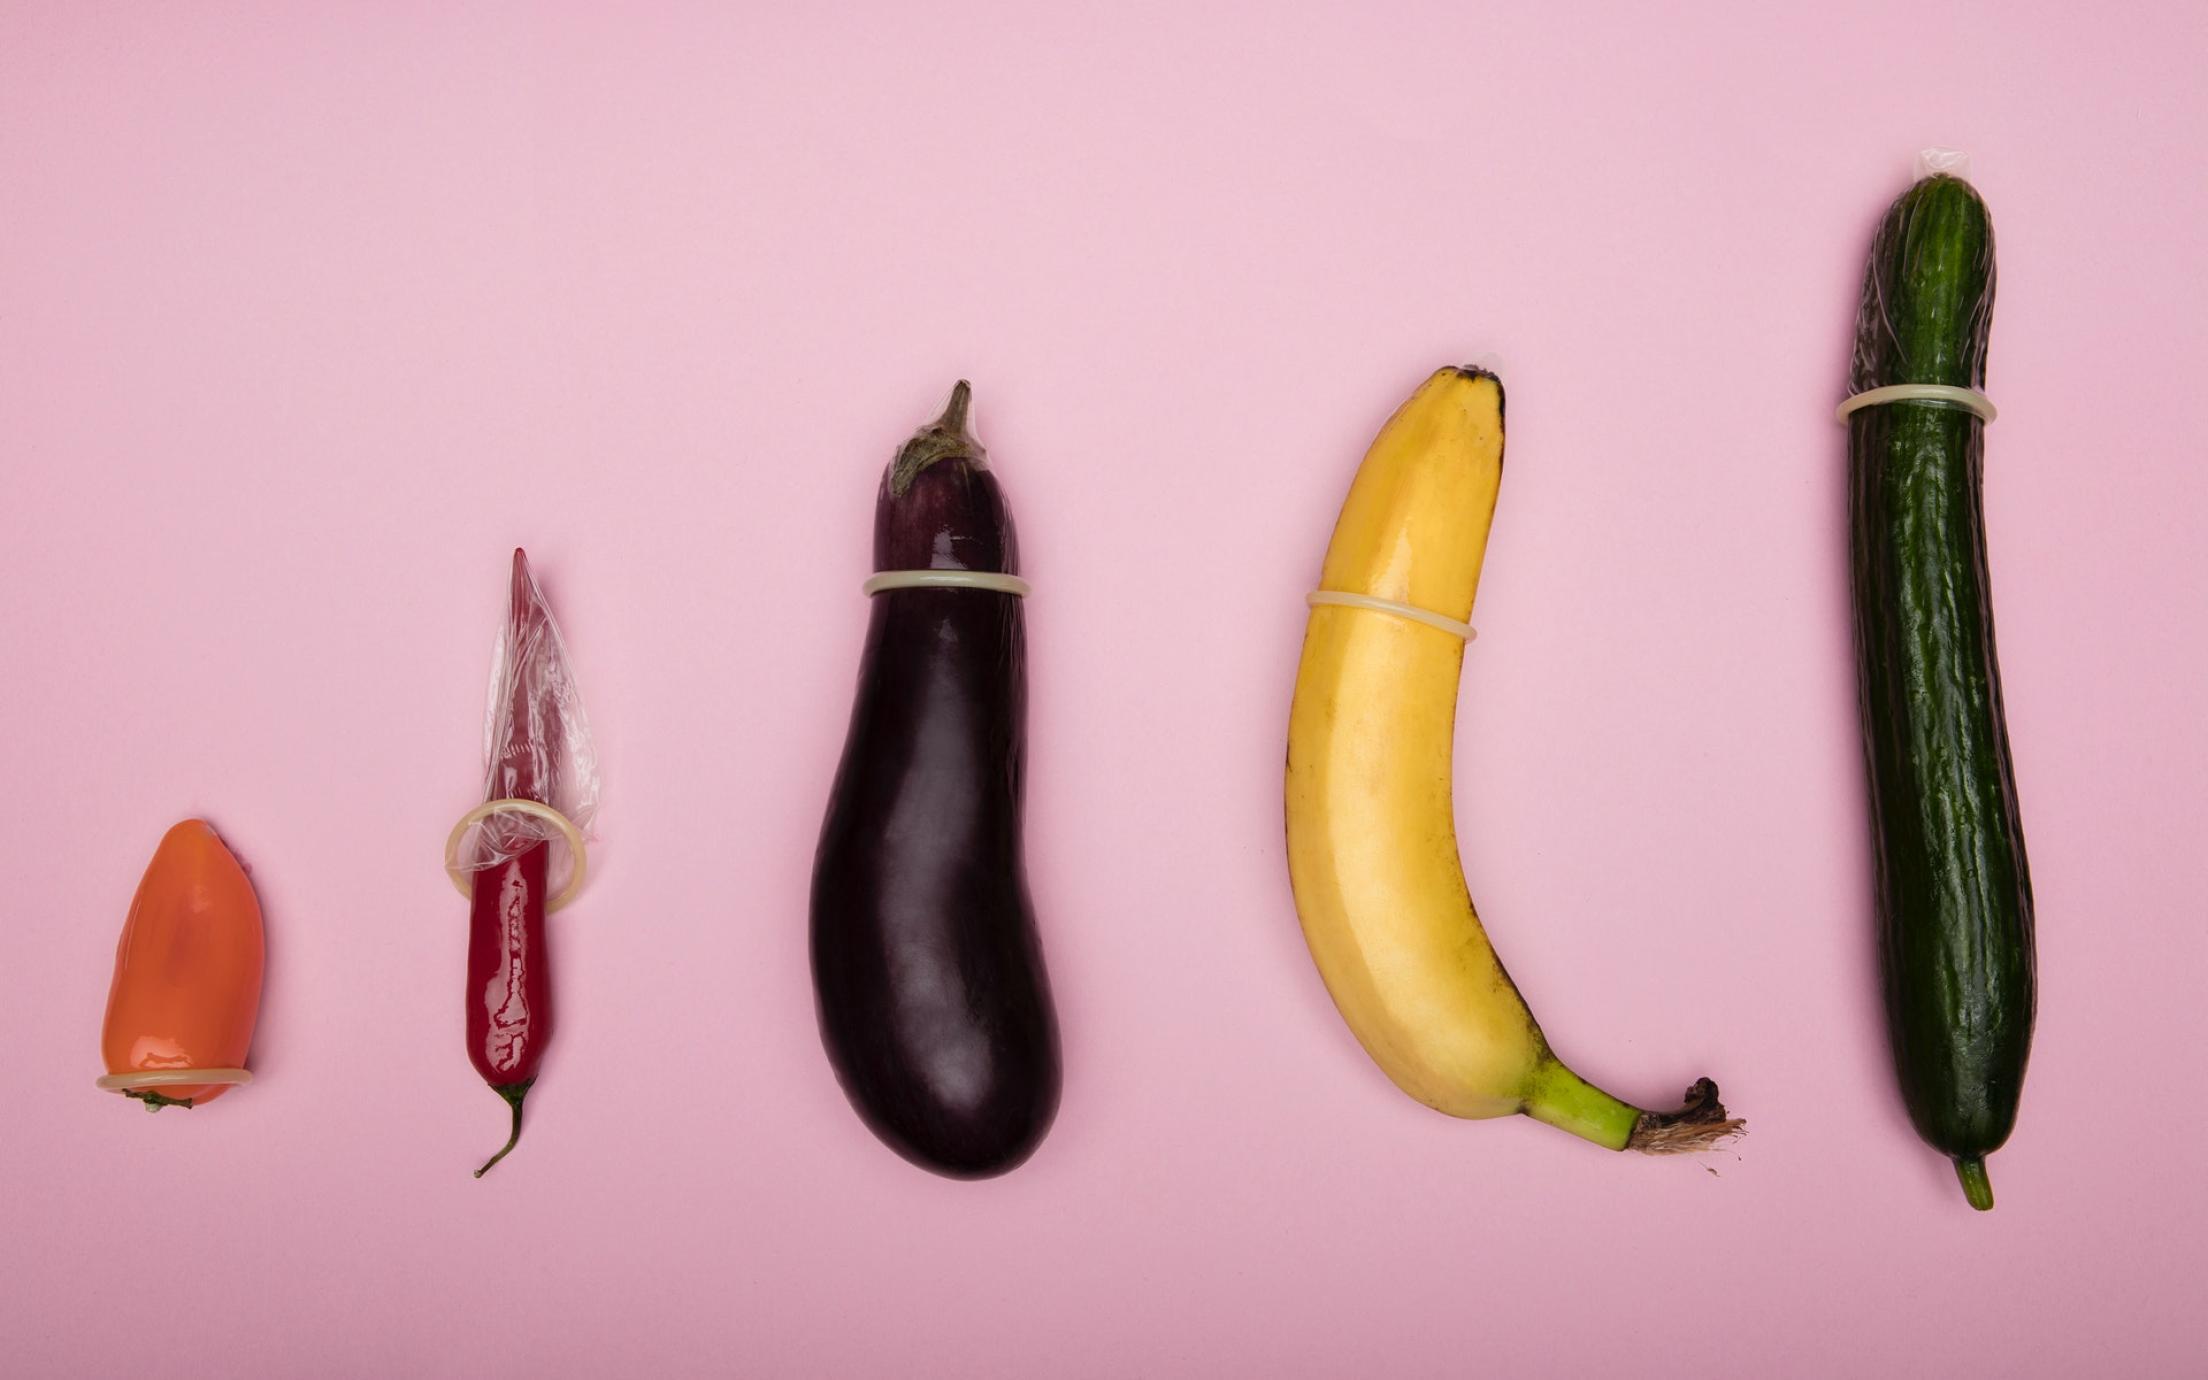 Condoms on veggies